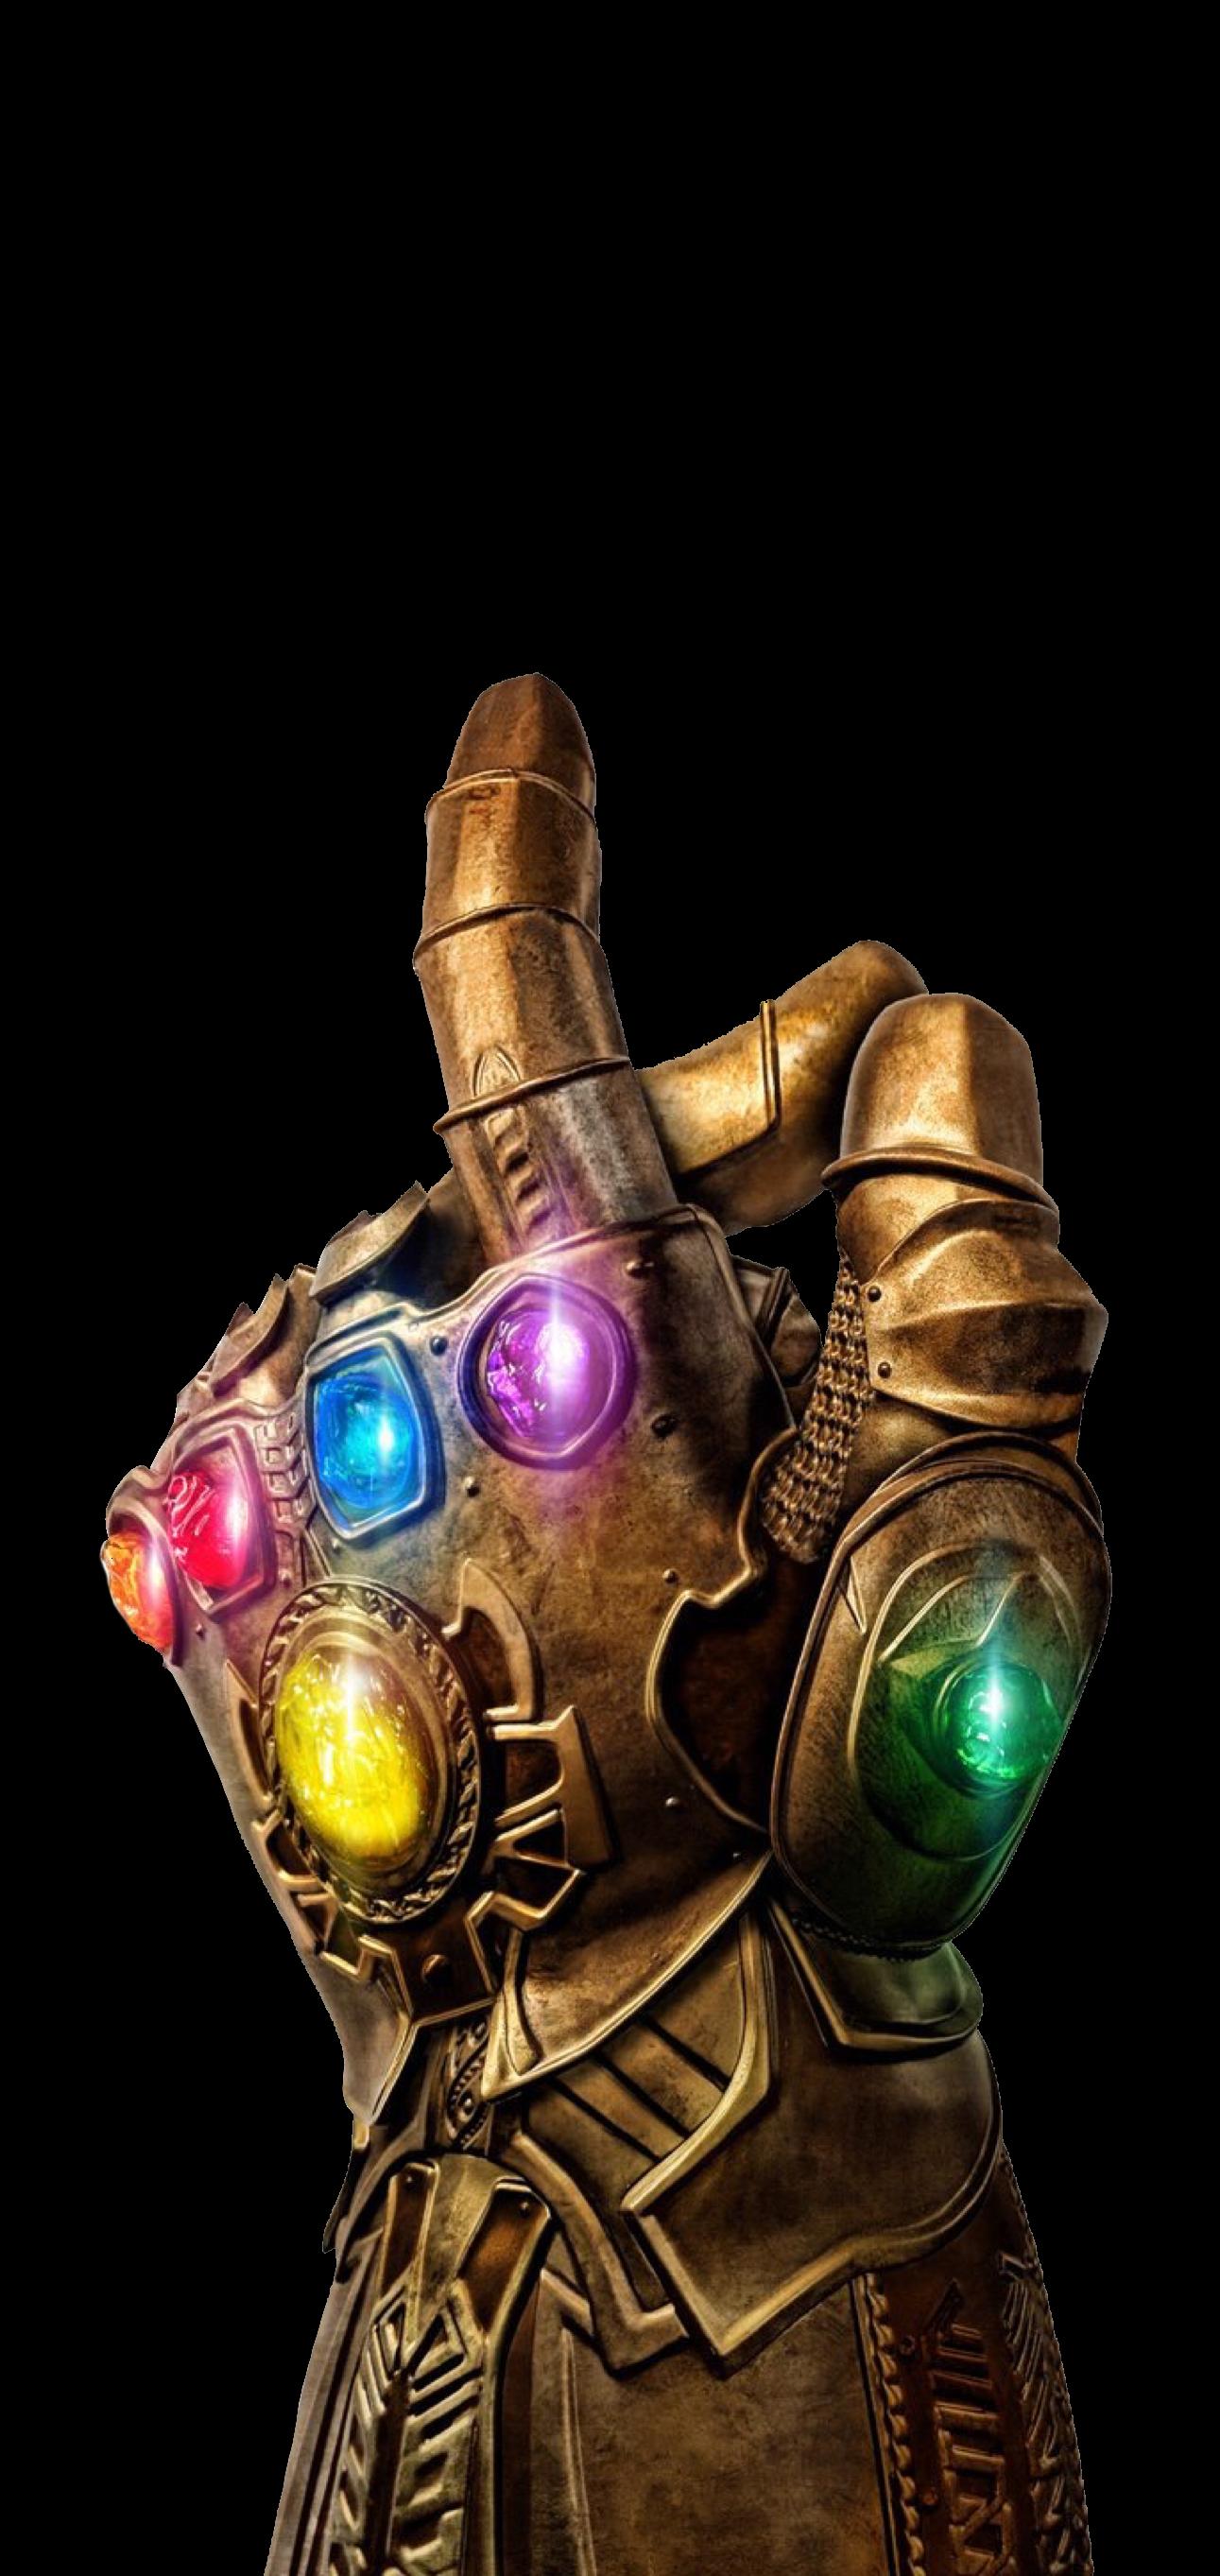 Infinity Gauntlet Thanos Wallpaper Hd For Phone Heroscreen Wallpapers Dark Wallpaper Purple Wallpaper Wallpaper